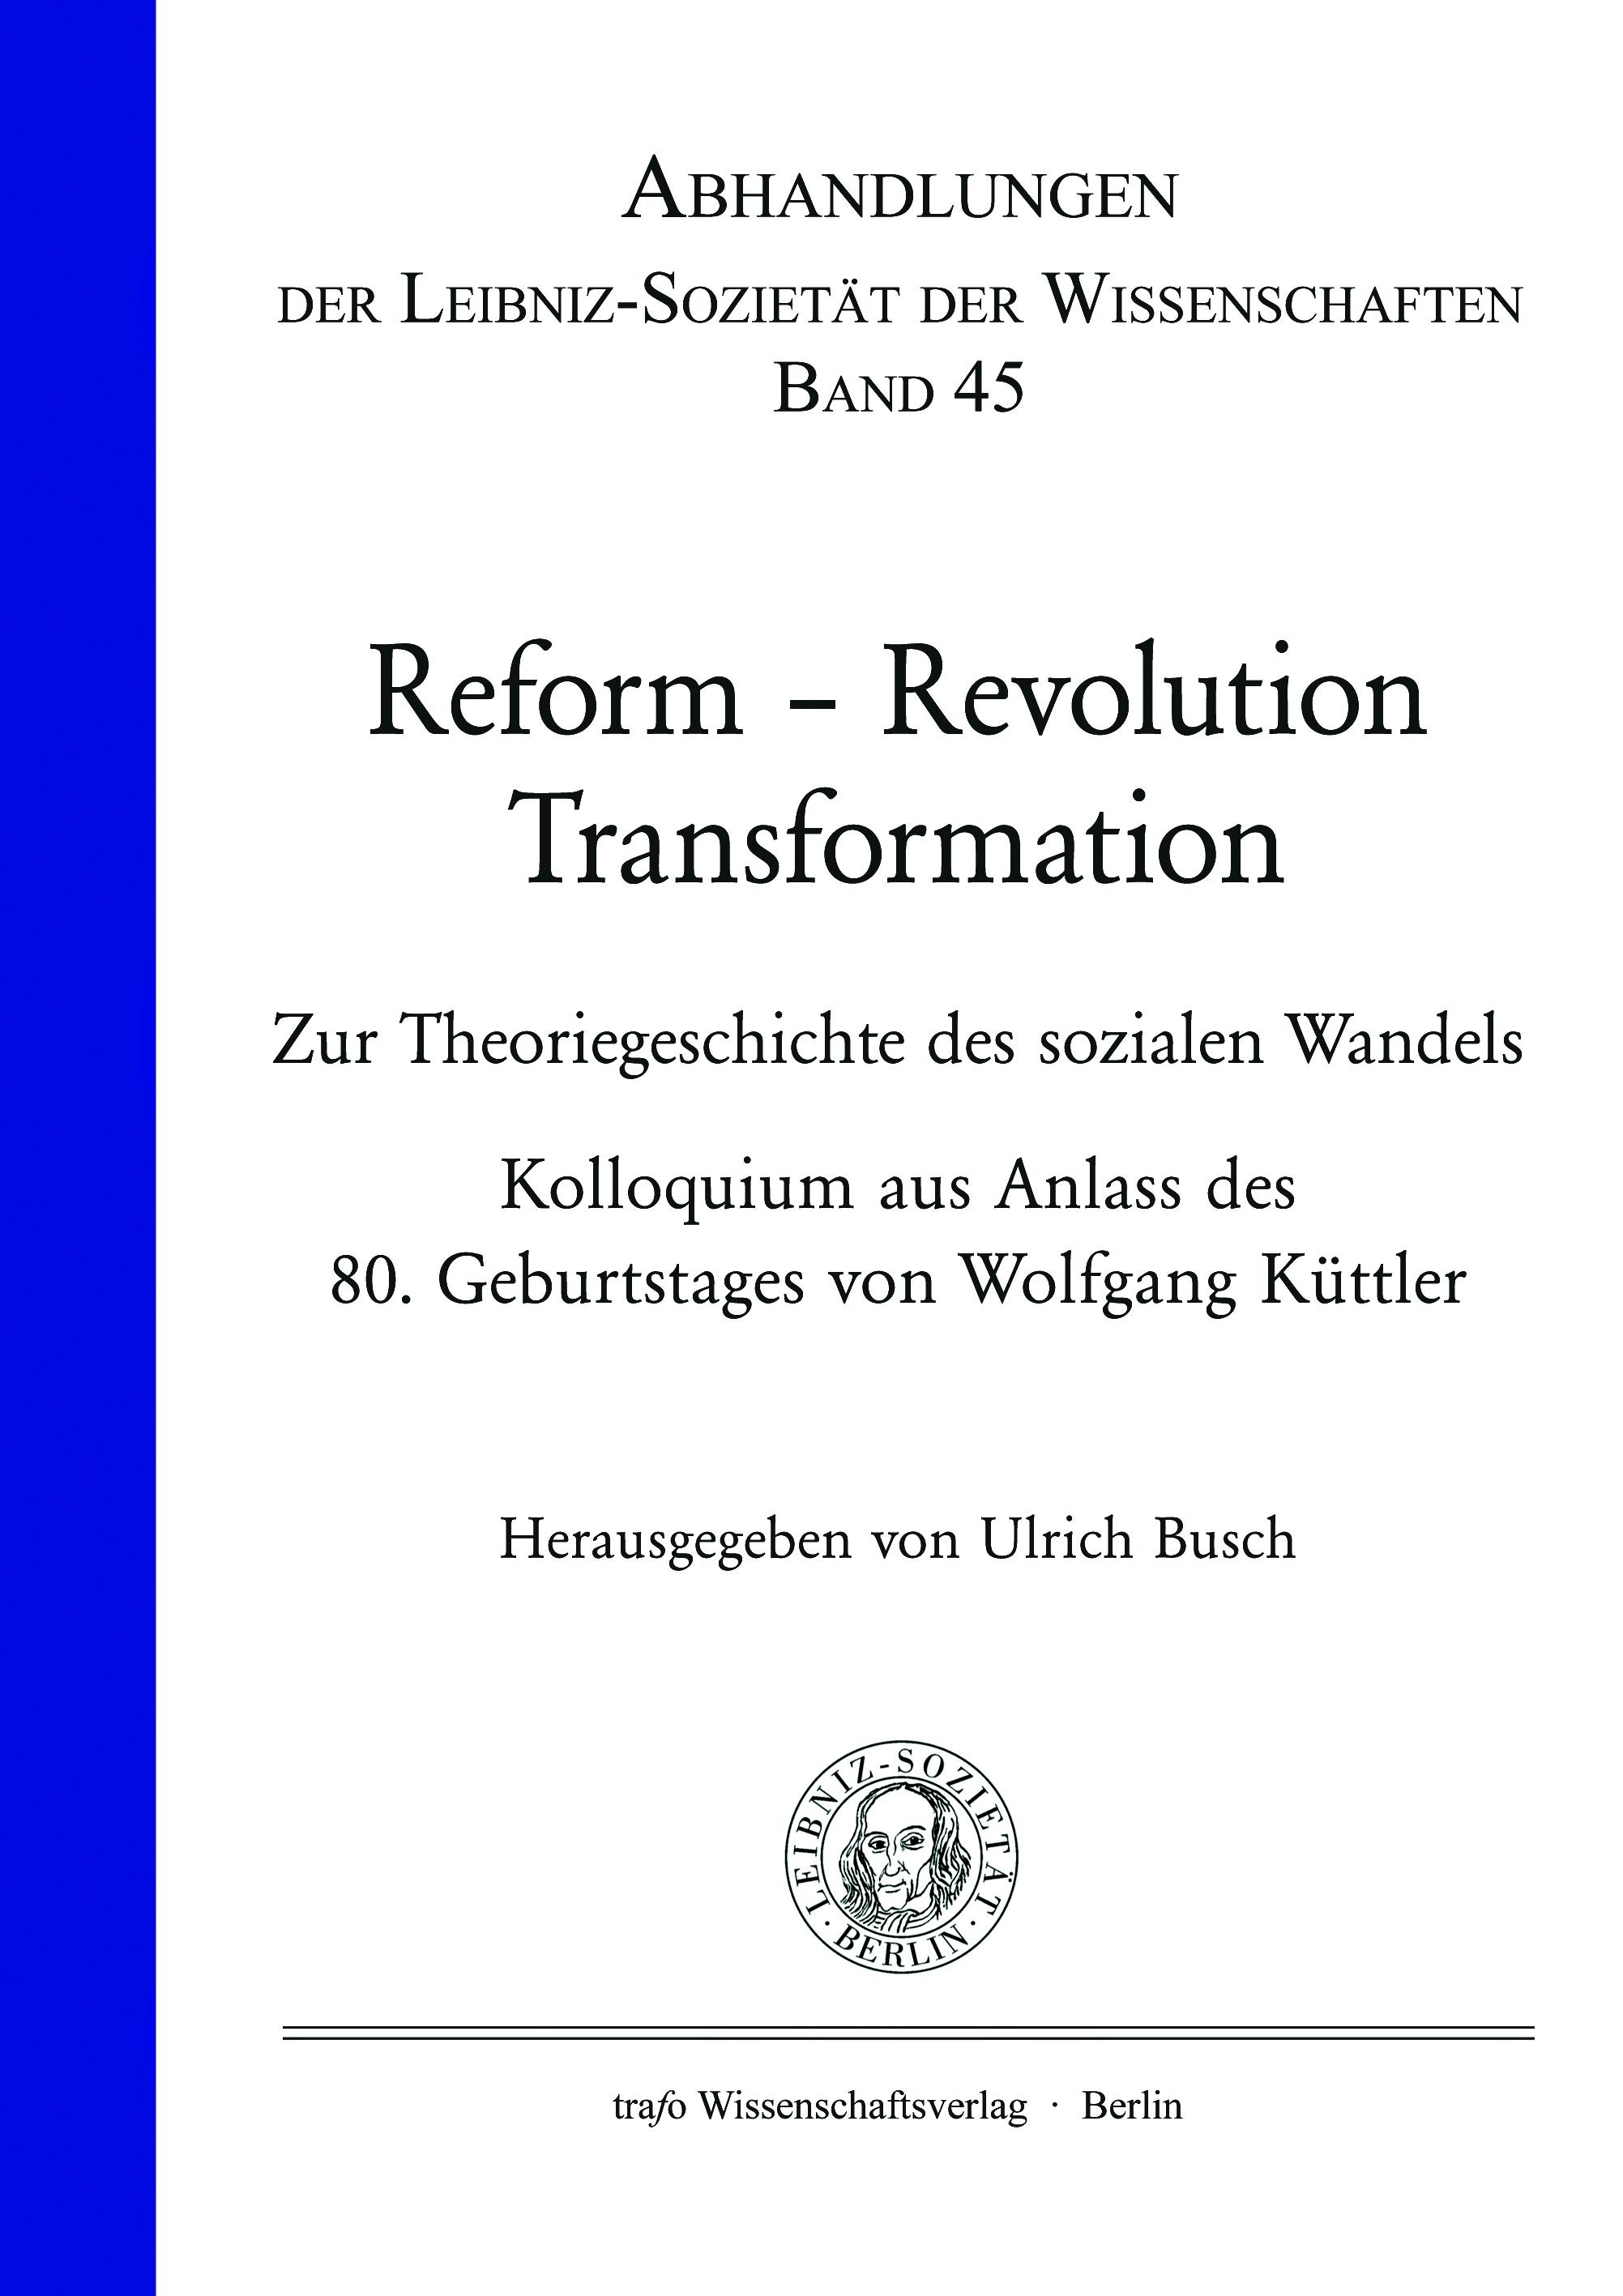 Leibniz-Abh_Bd_45_US_Seite_1_2016_09_20